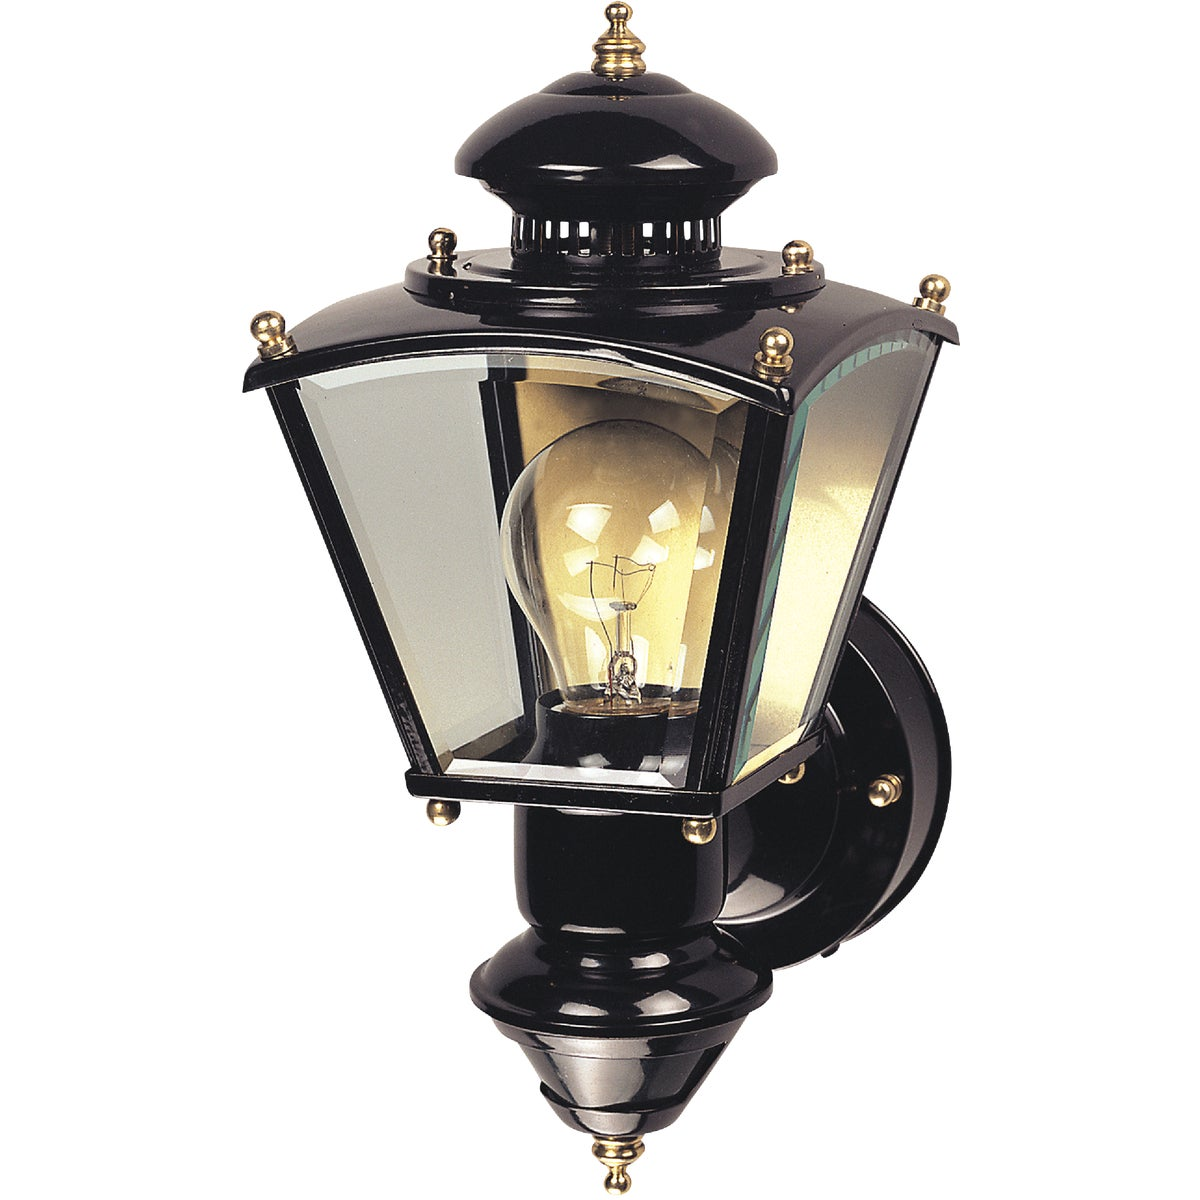 Heath Zenith Trine BLACK COACH MOTION LIGHT SL-4150-BK-B